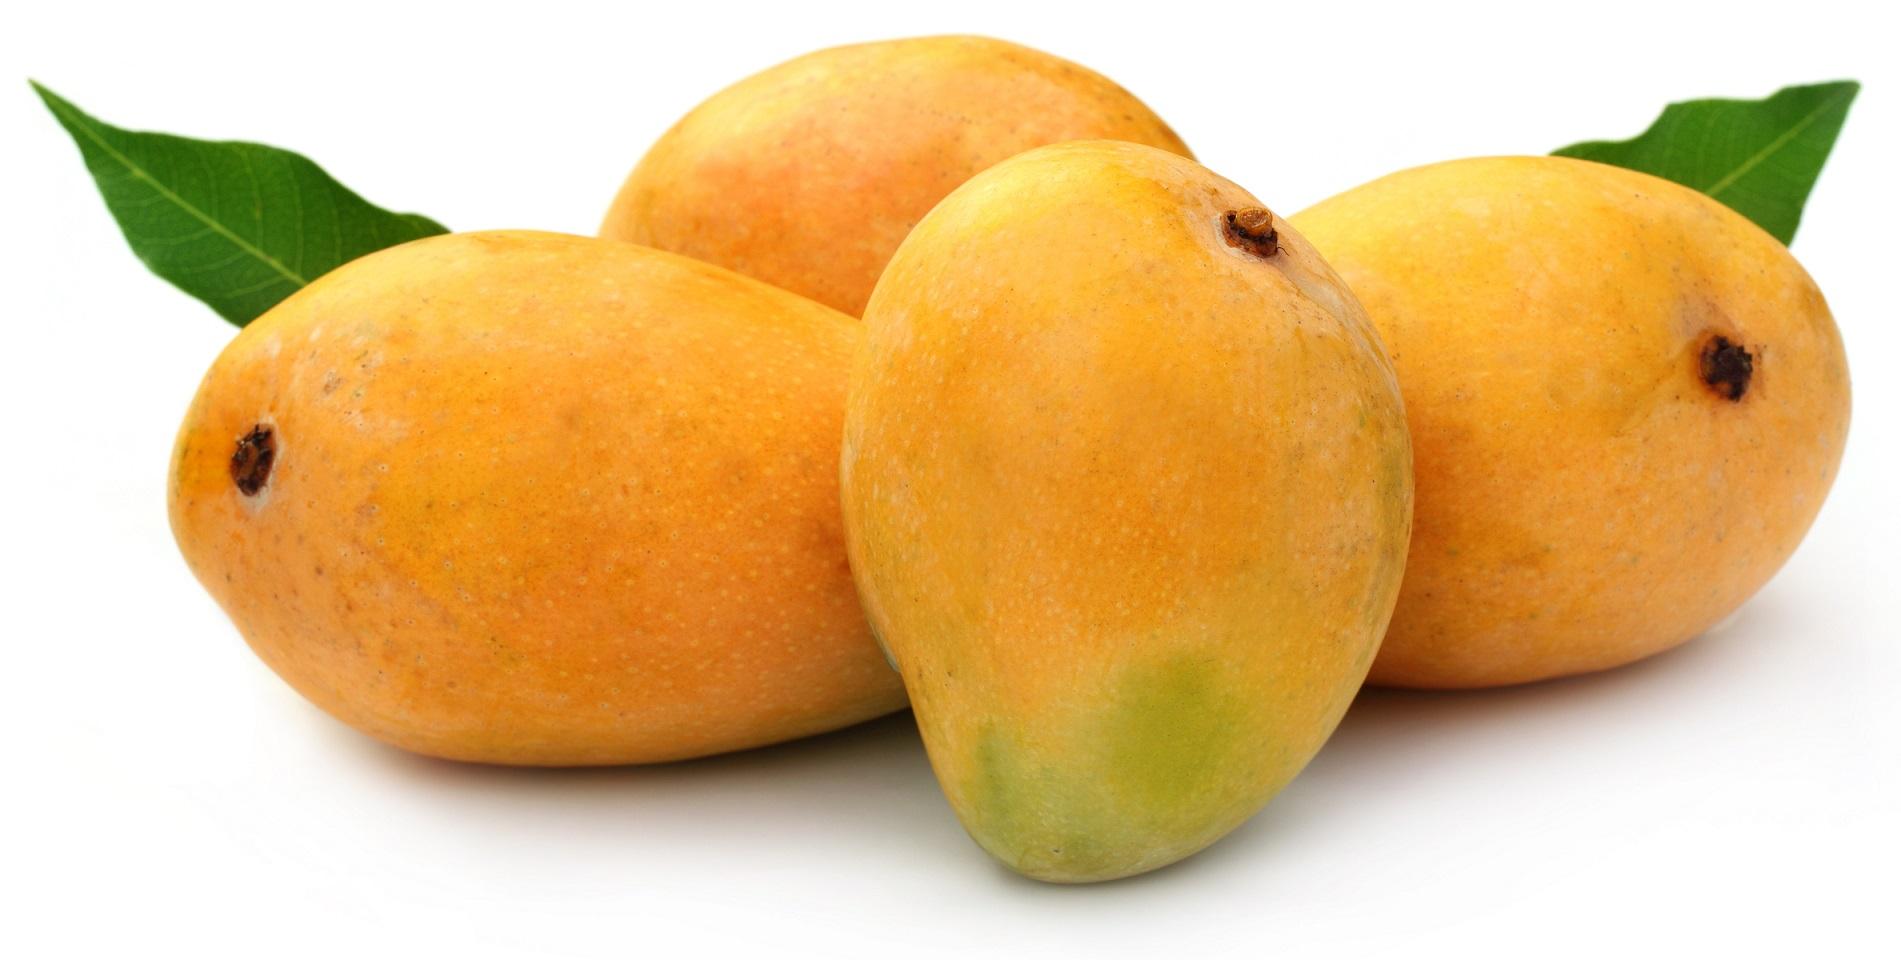 Mango HD wallpapers, Desktop wallpaper - most viewed